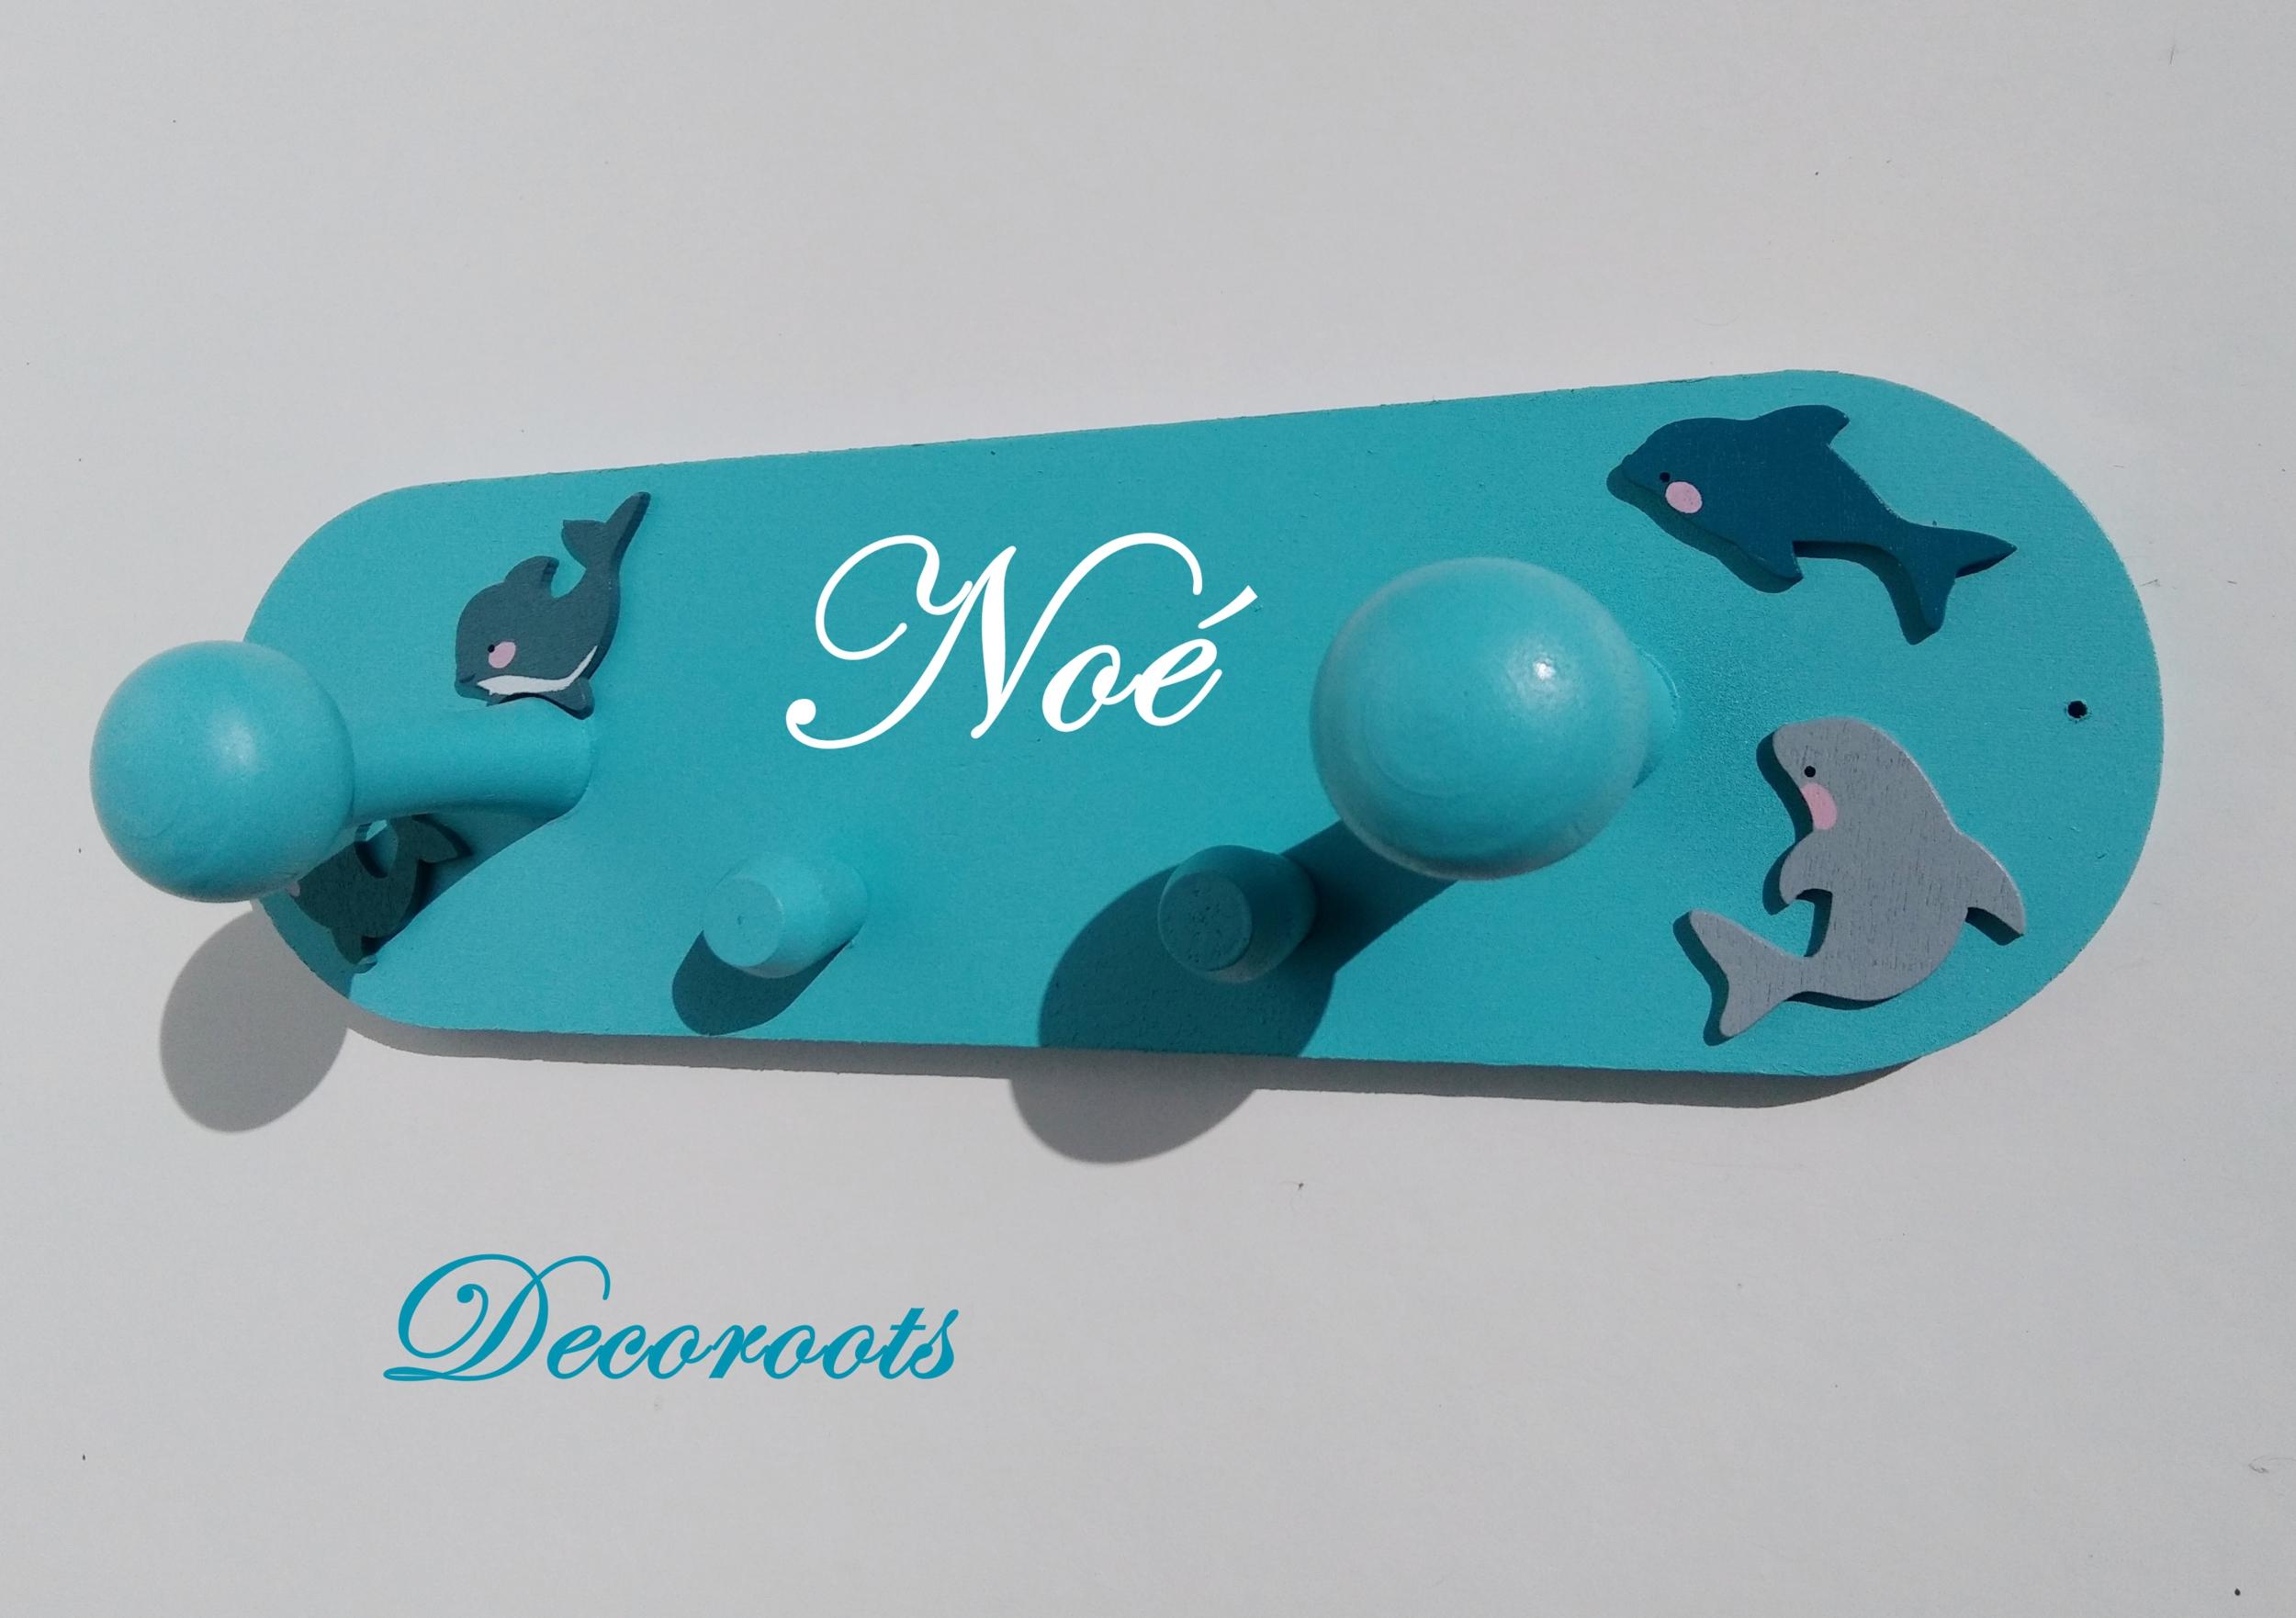 porte manteau poisson thème mer marin marine bord de mer bleu turquoise dauphin chambre enfant